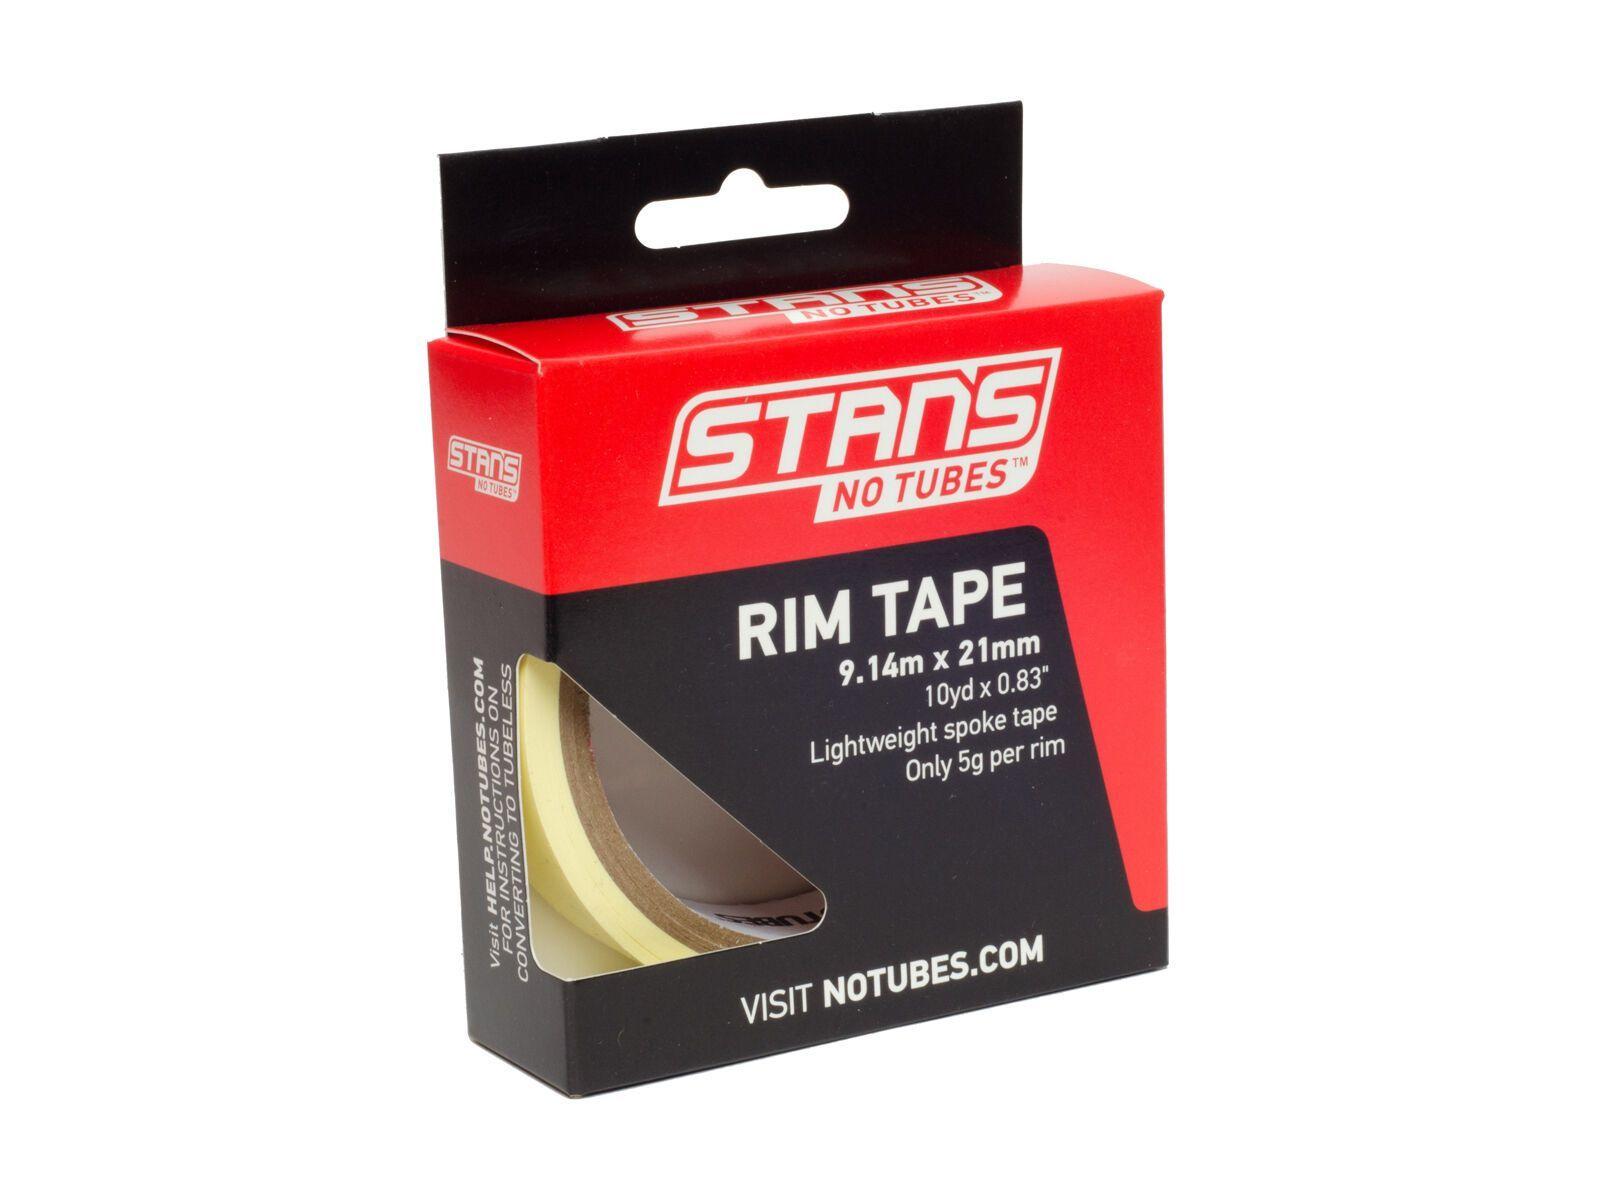 Stan's NoTubes Rim Tape 10yd x 21 mm - Felgenband 333000024